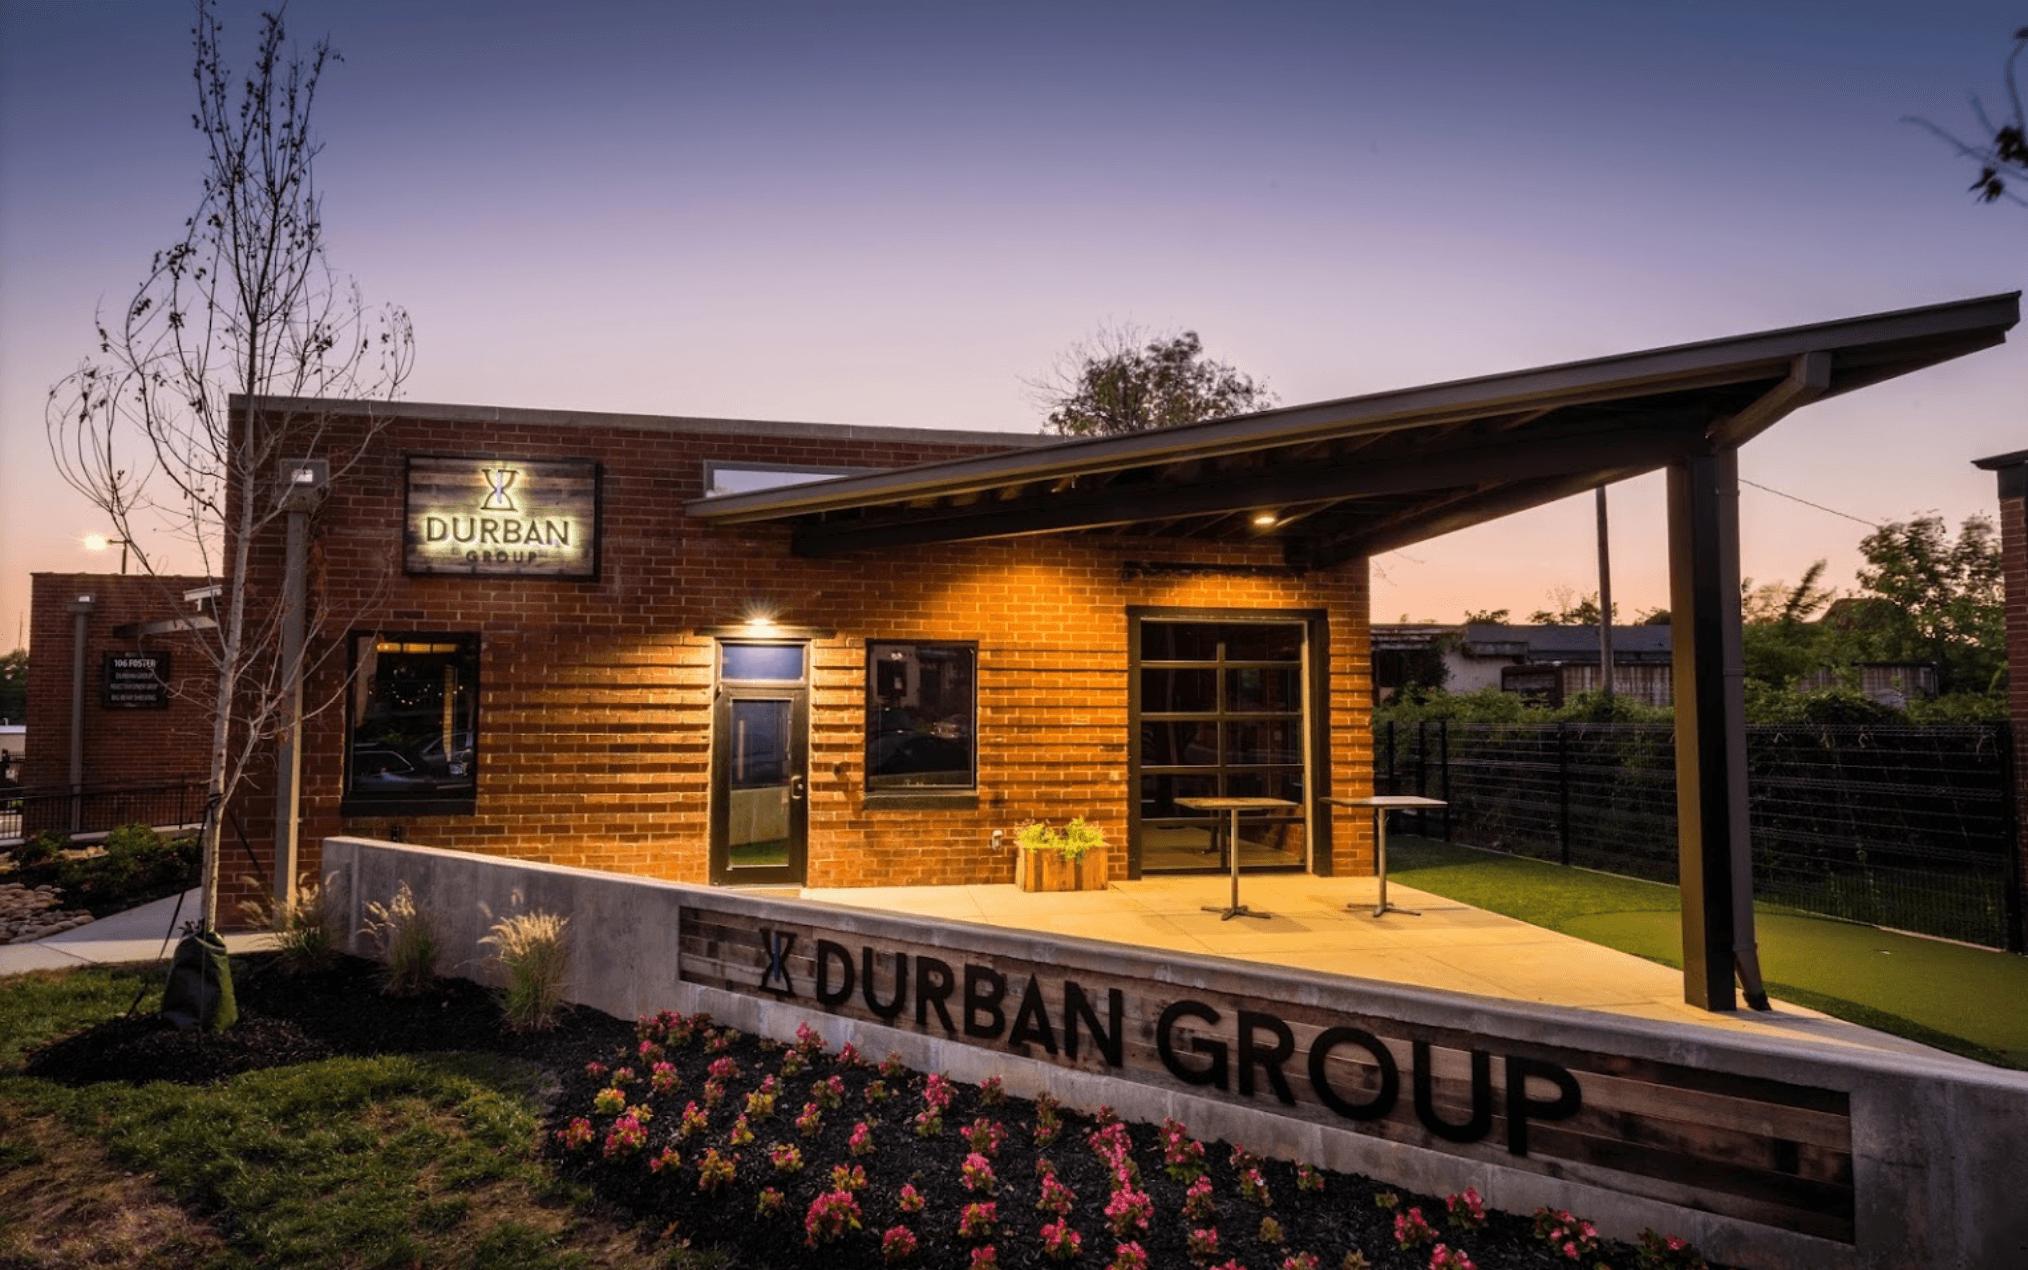 Durban Group